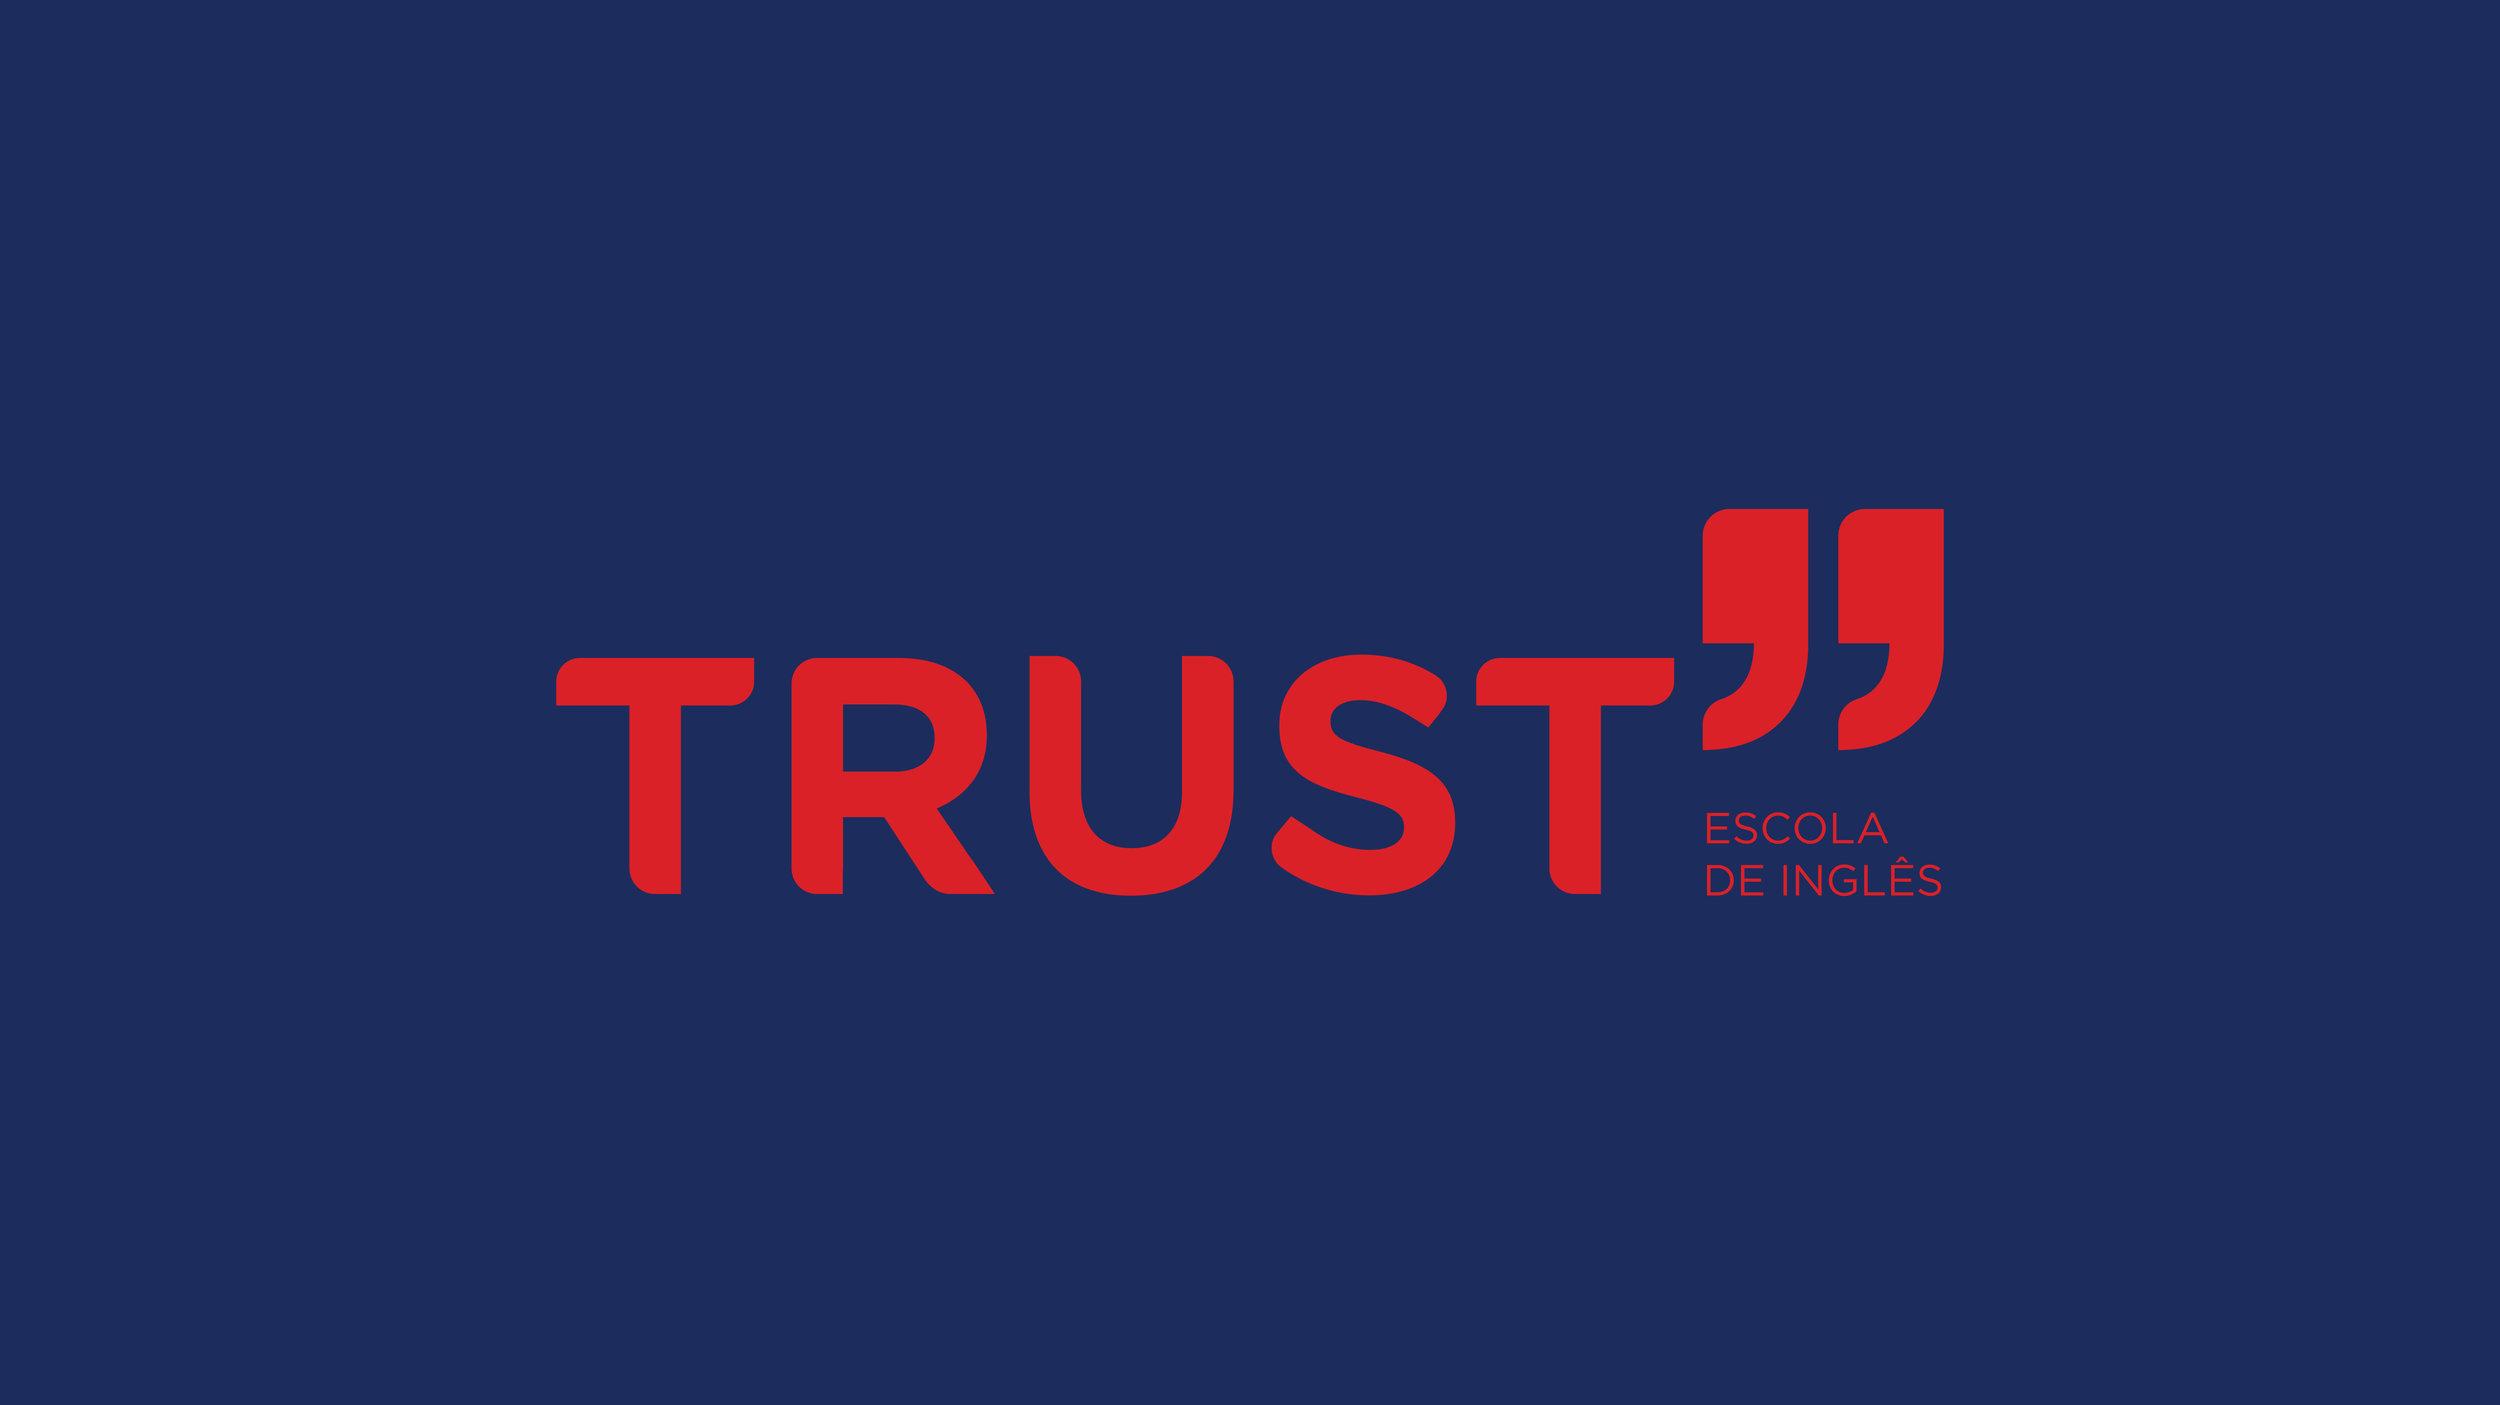 trust_final_03.jpg